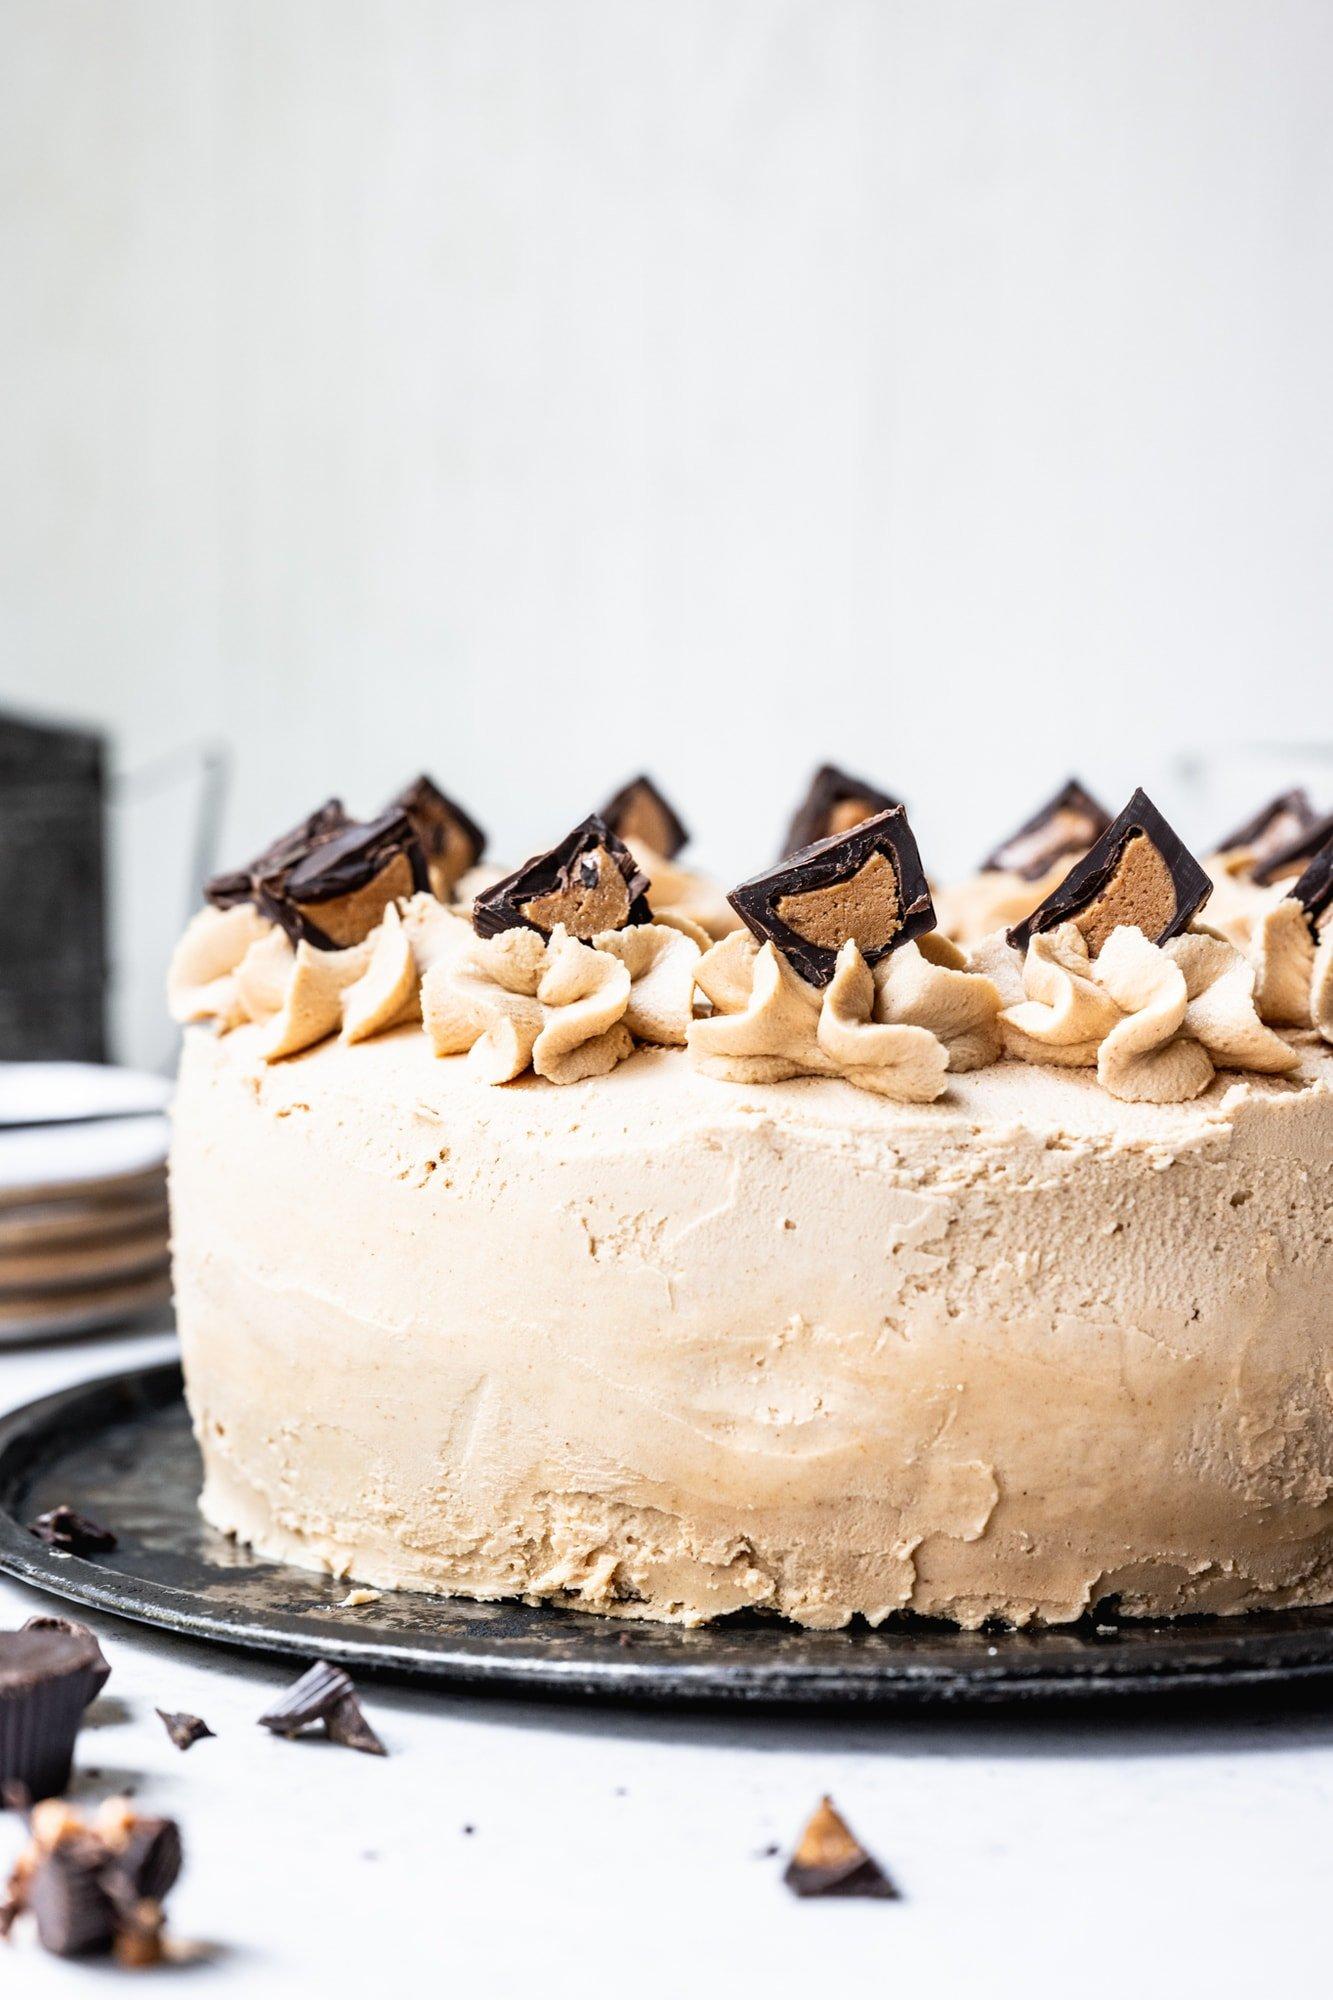 side view of vegan peanut butter ice cream cake